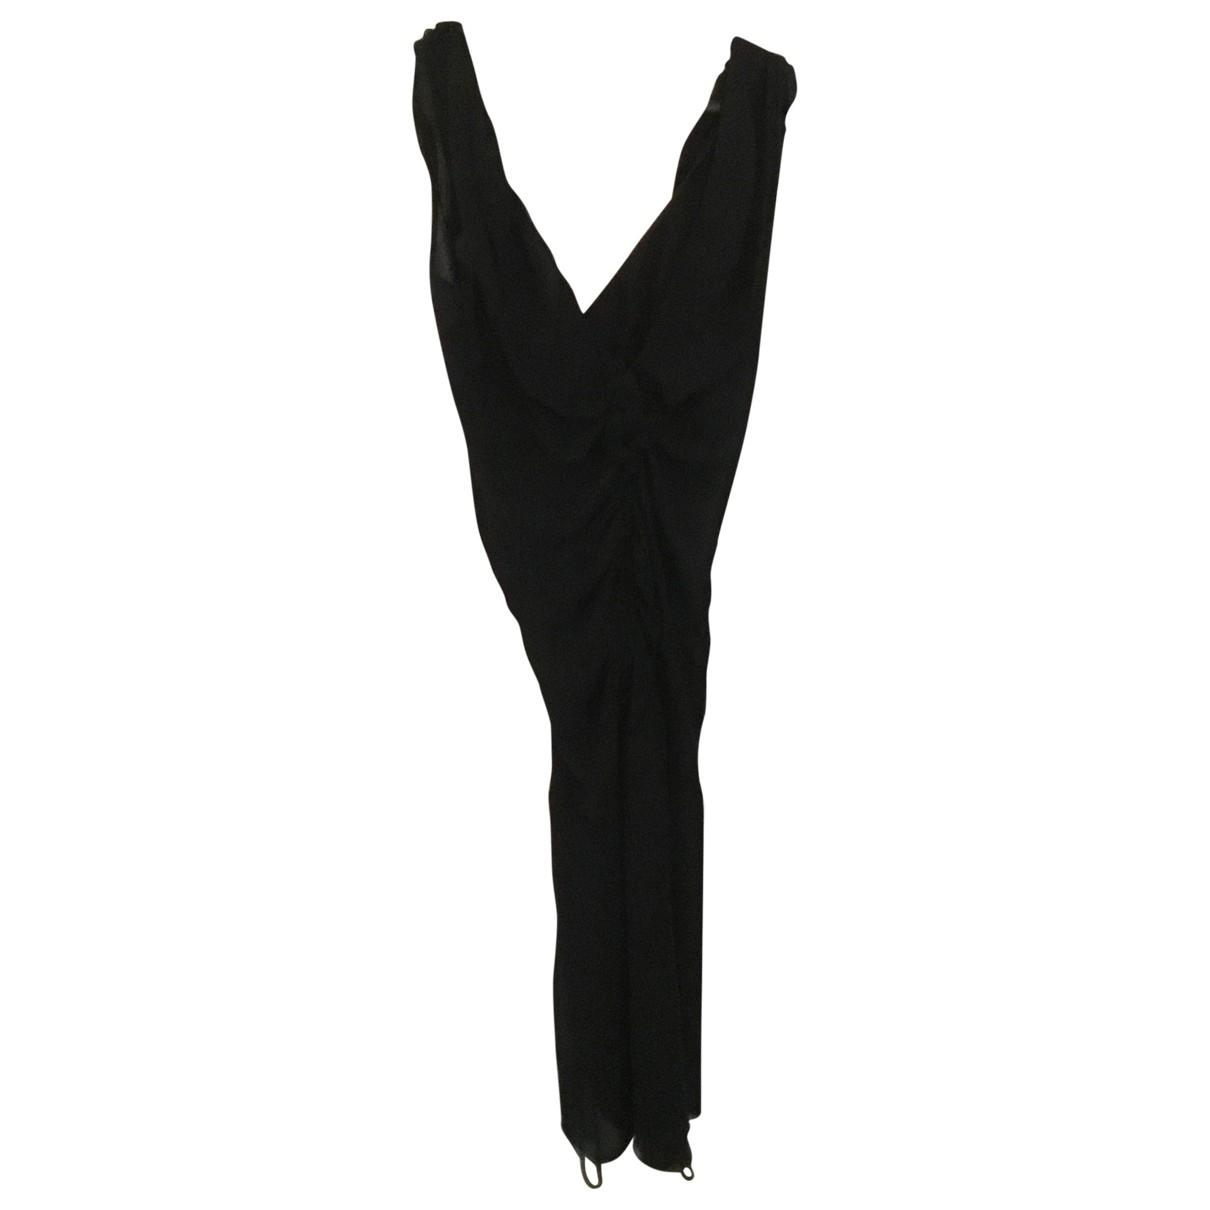 Prada \N Black Silk dress for Women 44 IT